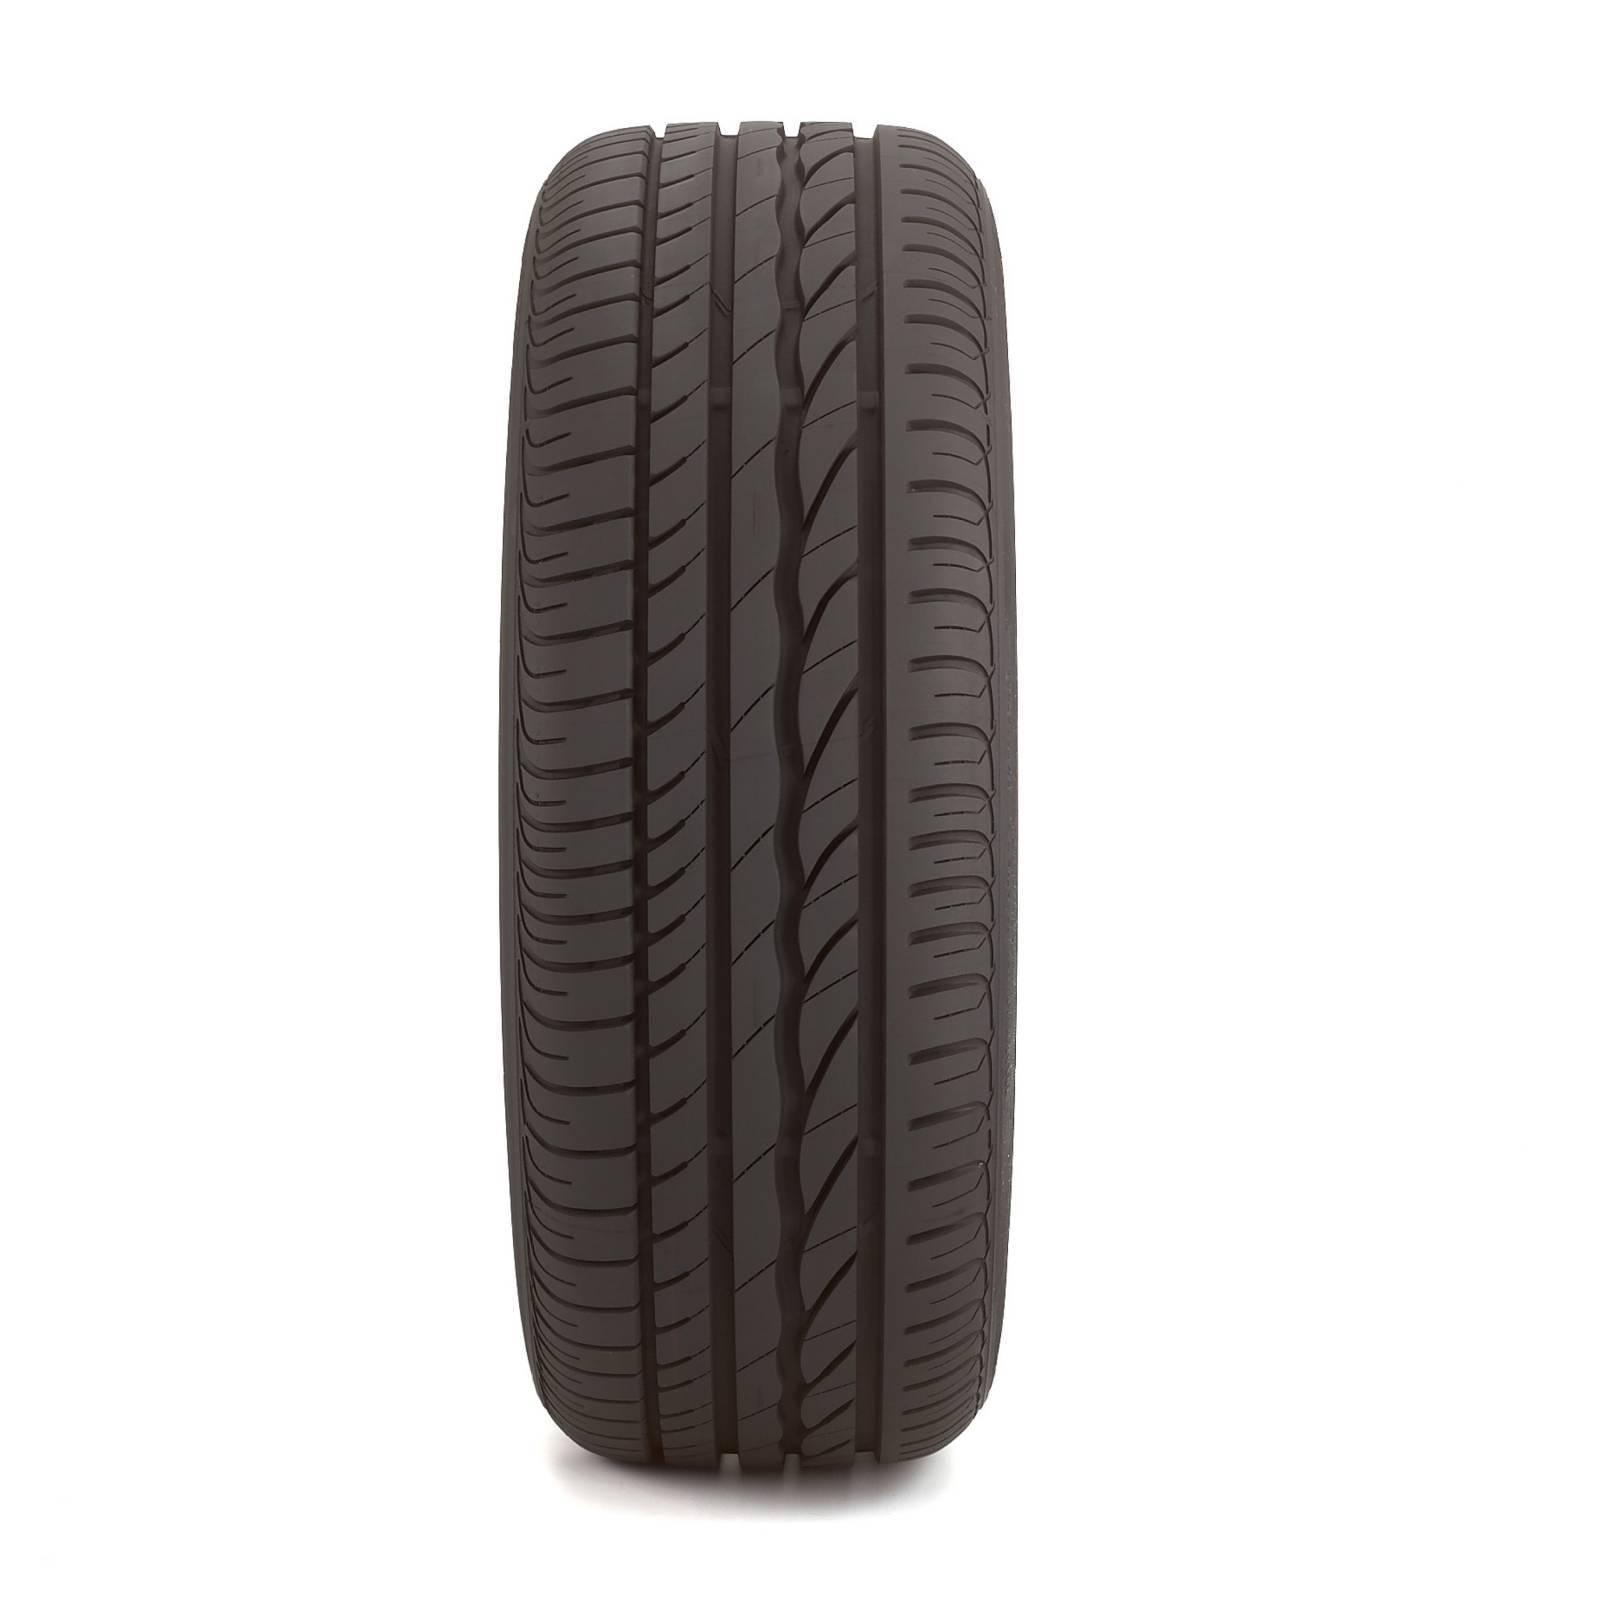 Pneu Bridgestone Turanza ER300 195/65 R15 91H - Cantele Centro Automotivo